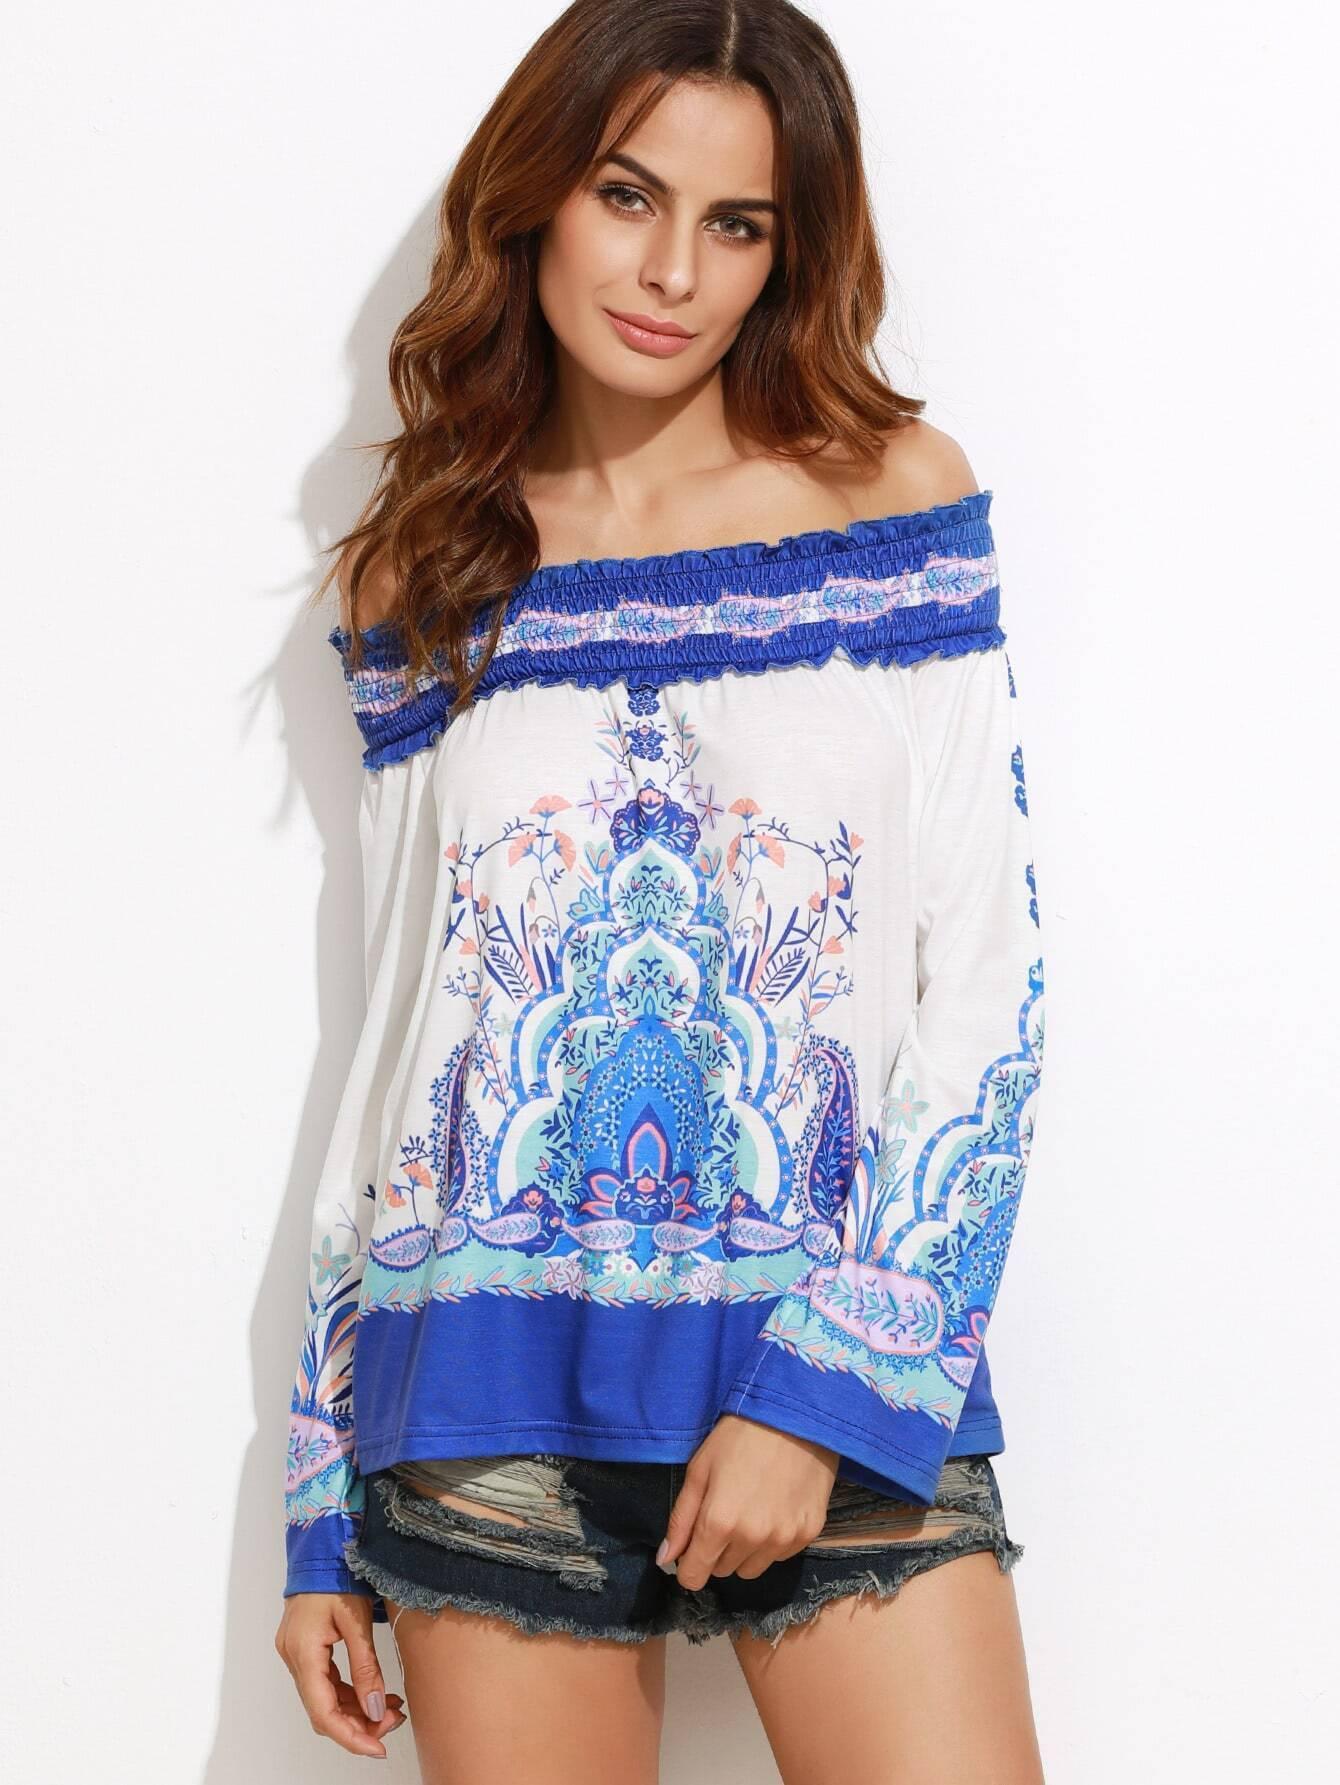 blouse160928705_2